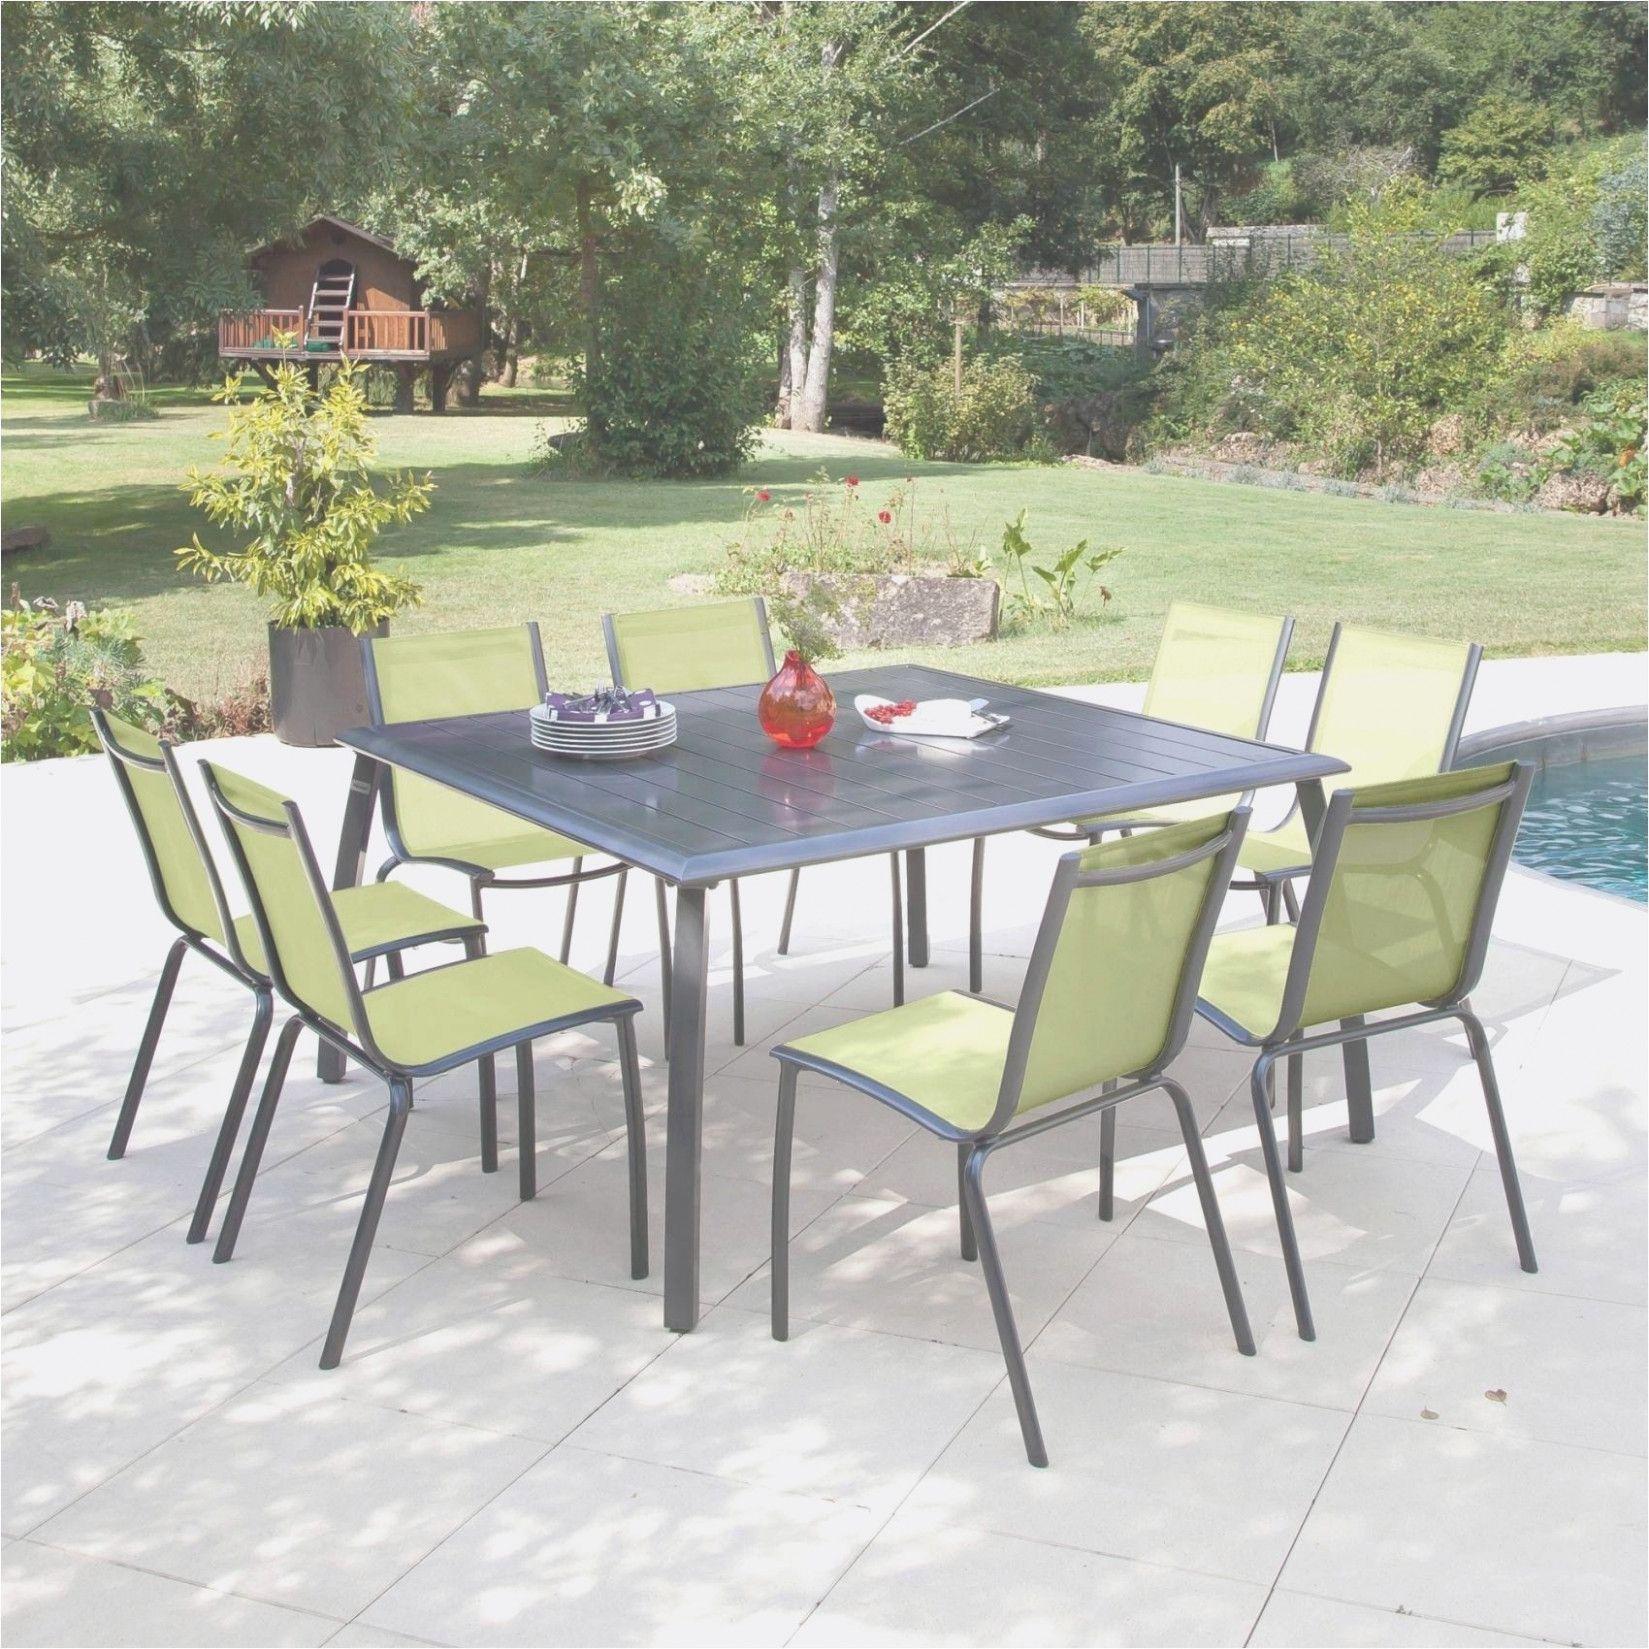 Salon De Jardin In 2020 Outdoor Furniture Sets Outdoor